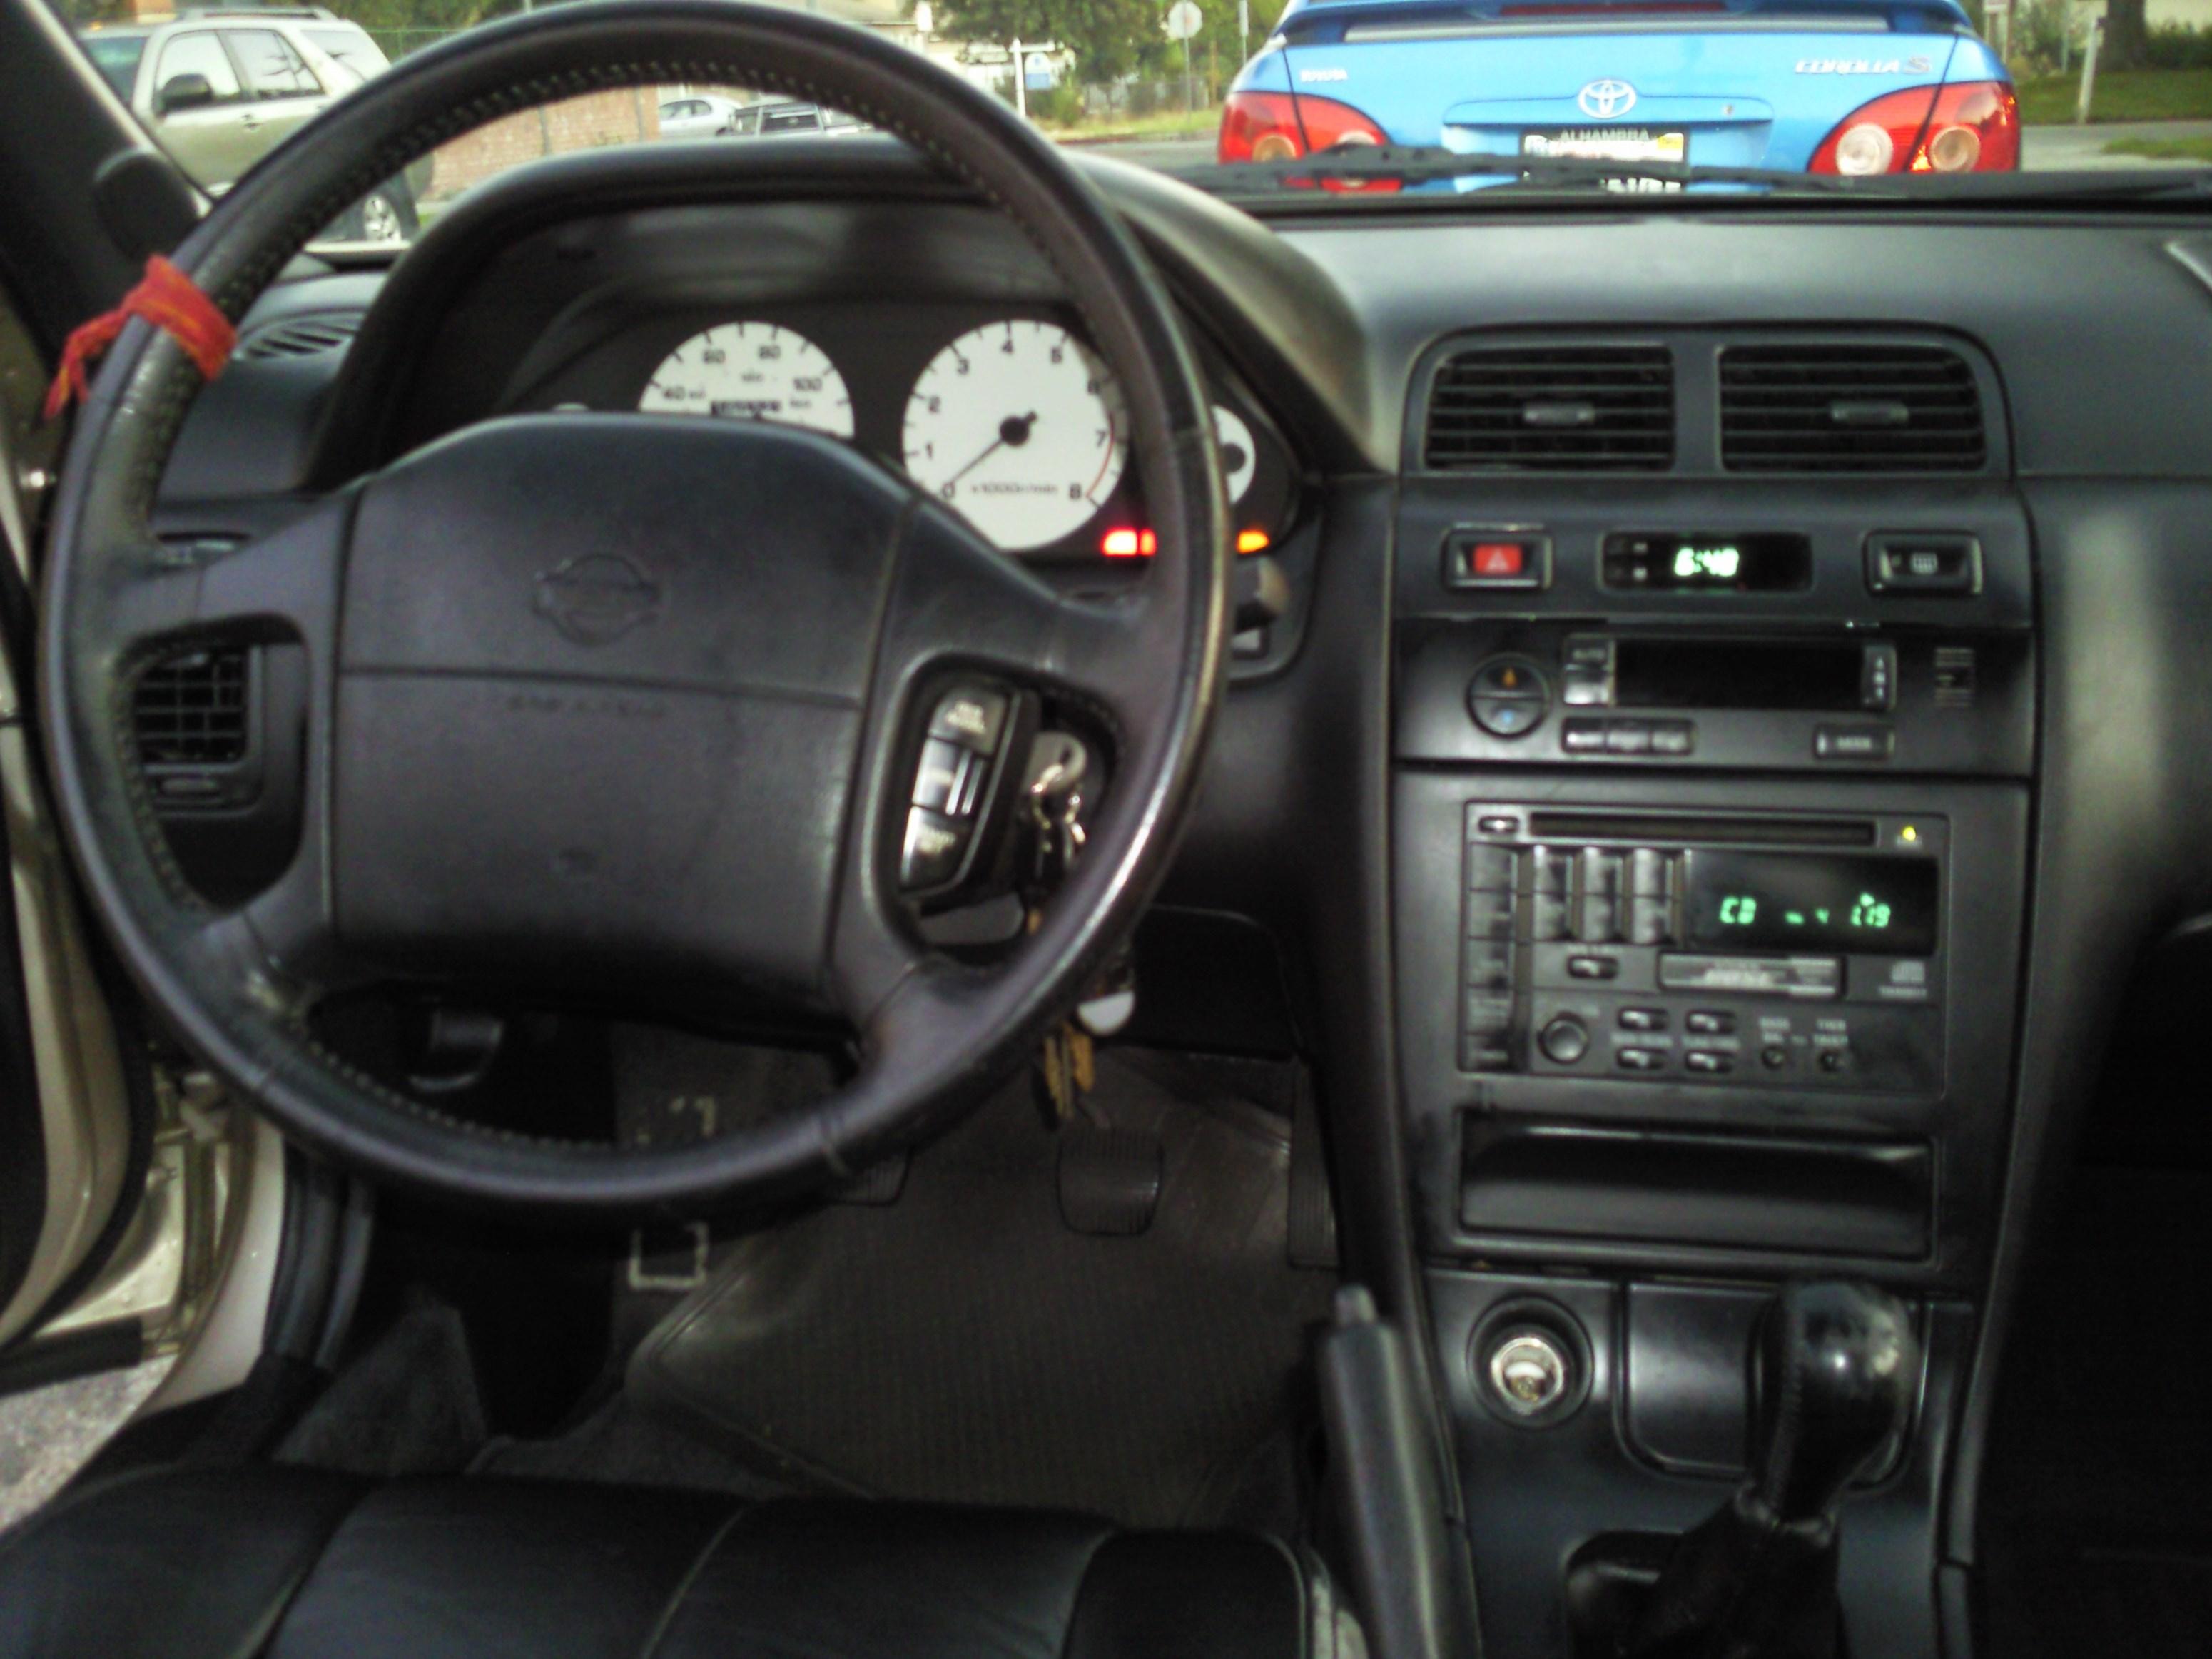 1999 Nissan Sentra Manual Transmission - Data Wiring Diagrams •